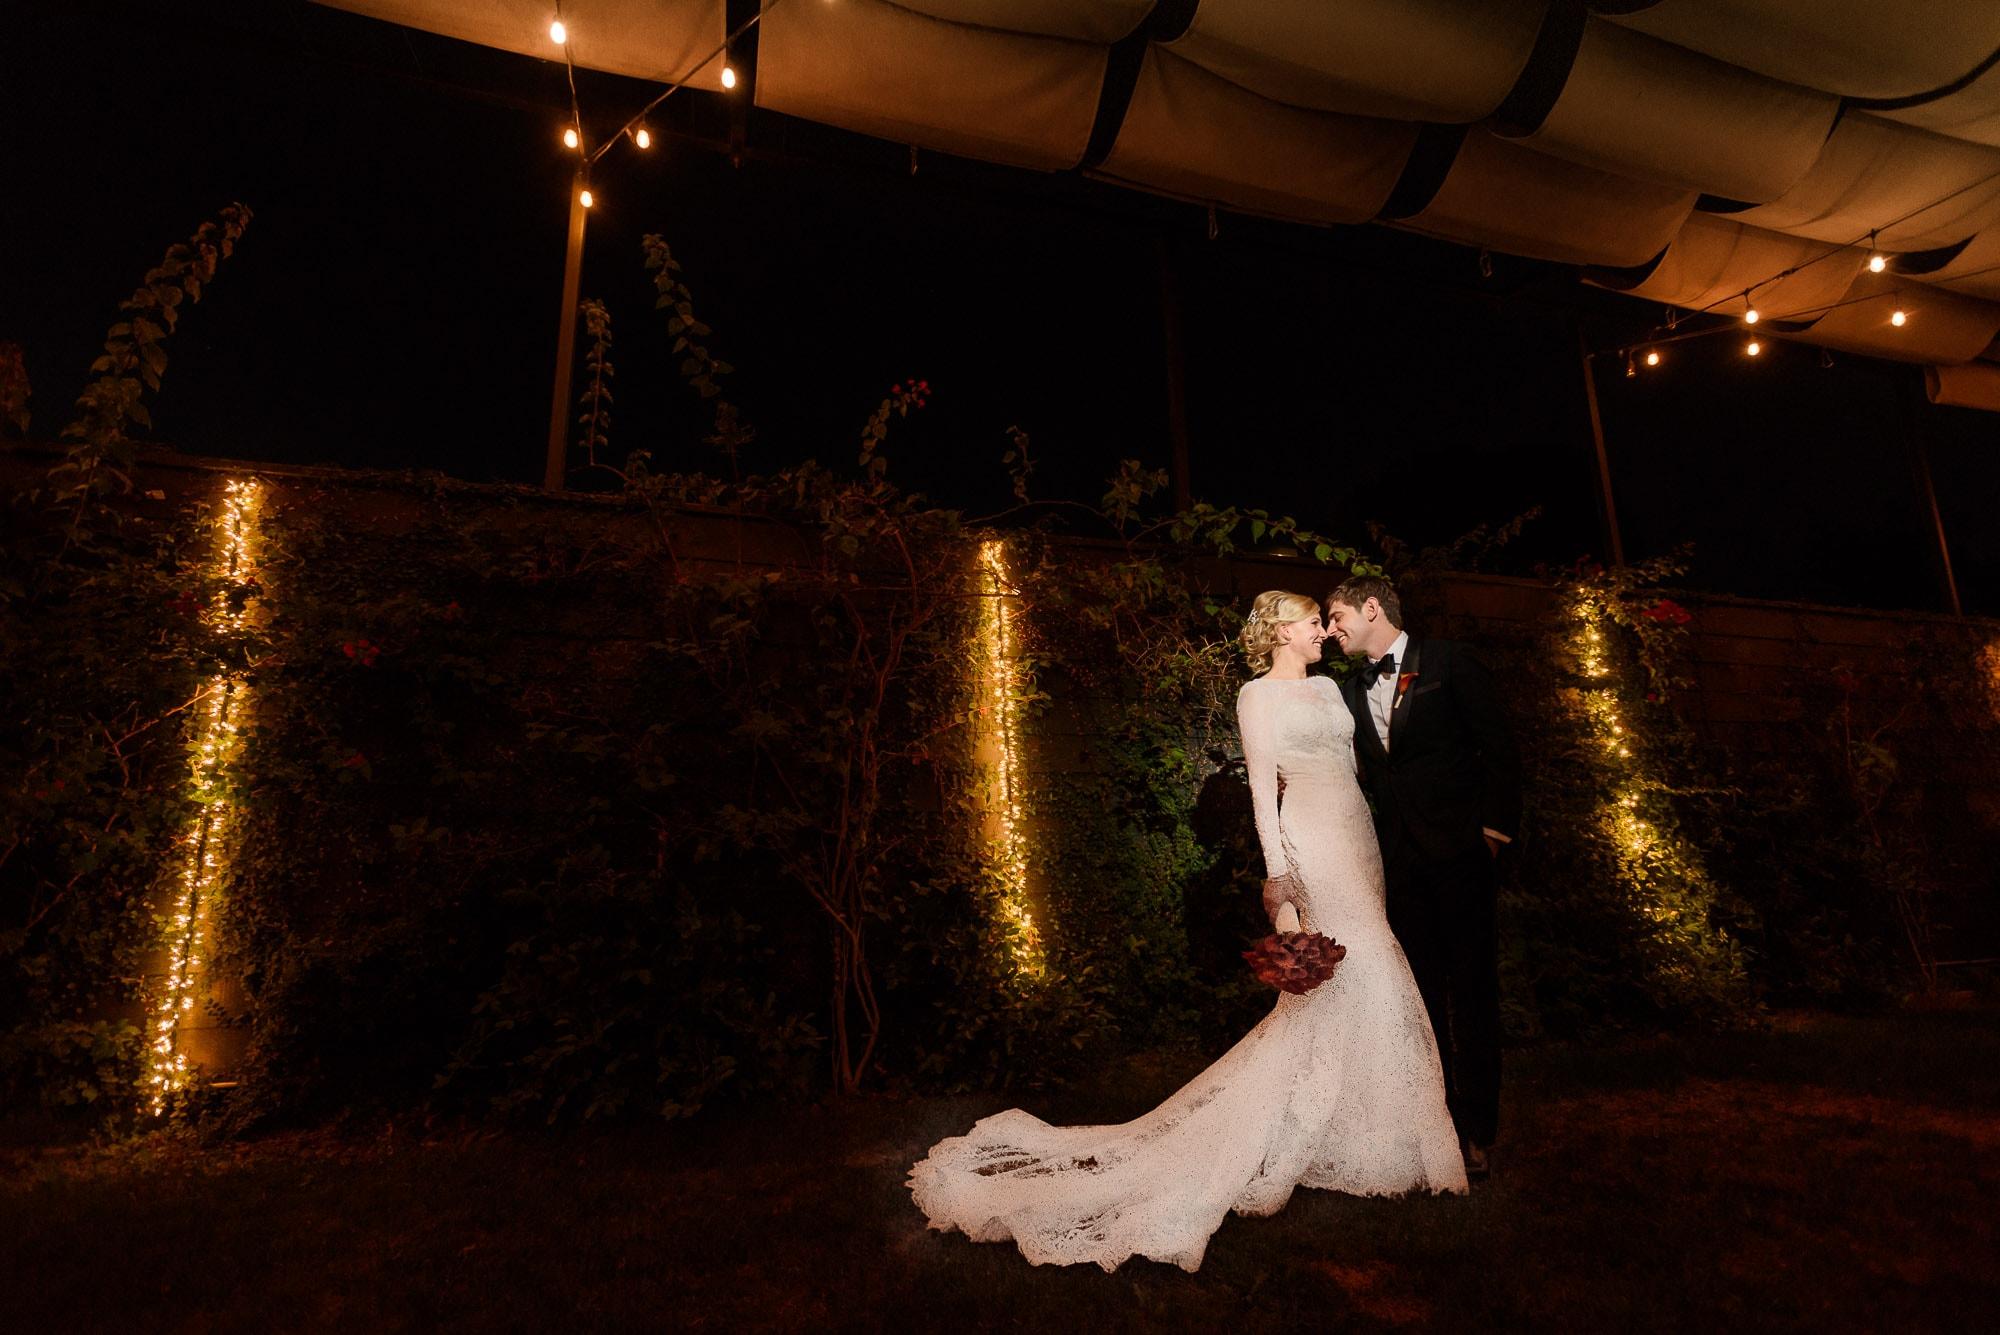 060_Alan_and_Heidi_Los_Angeles_Equestrian_Center_Wedding